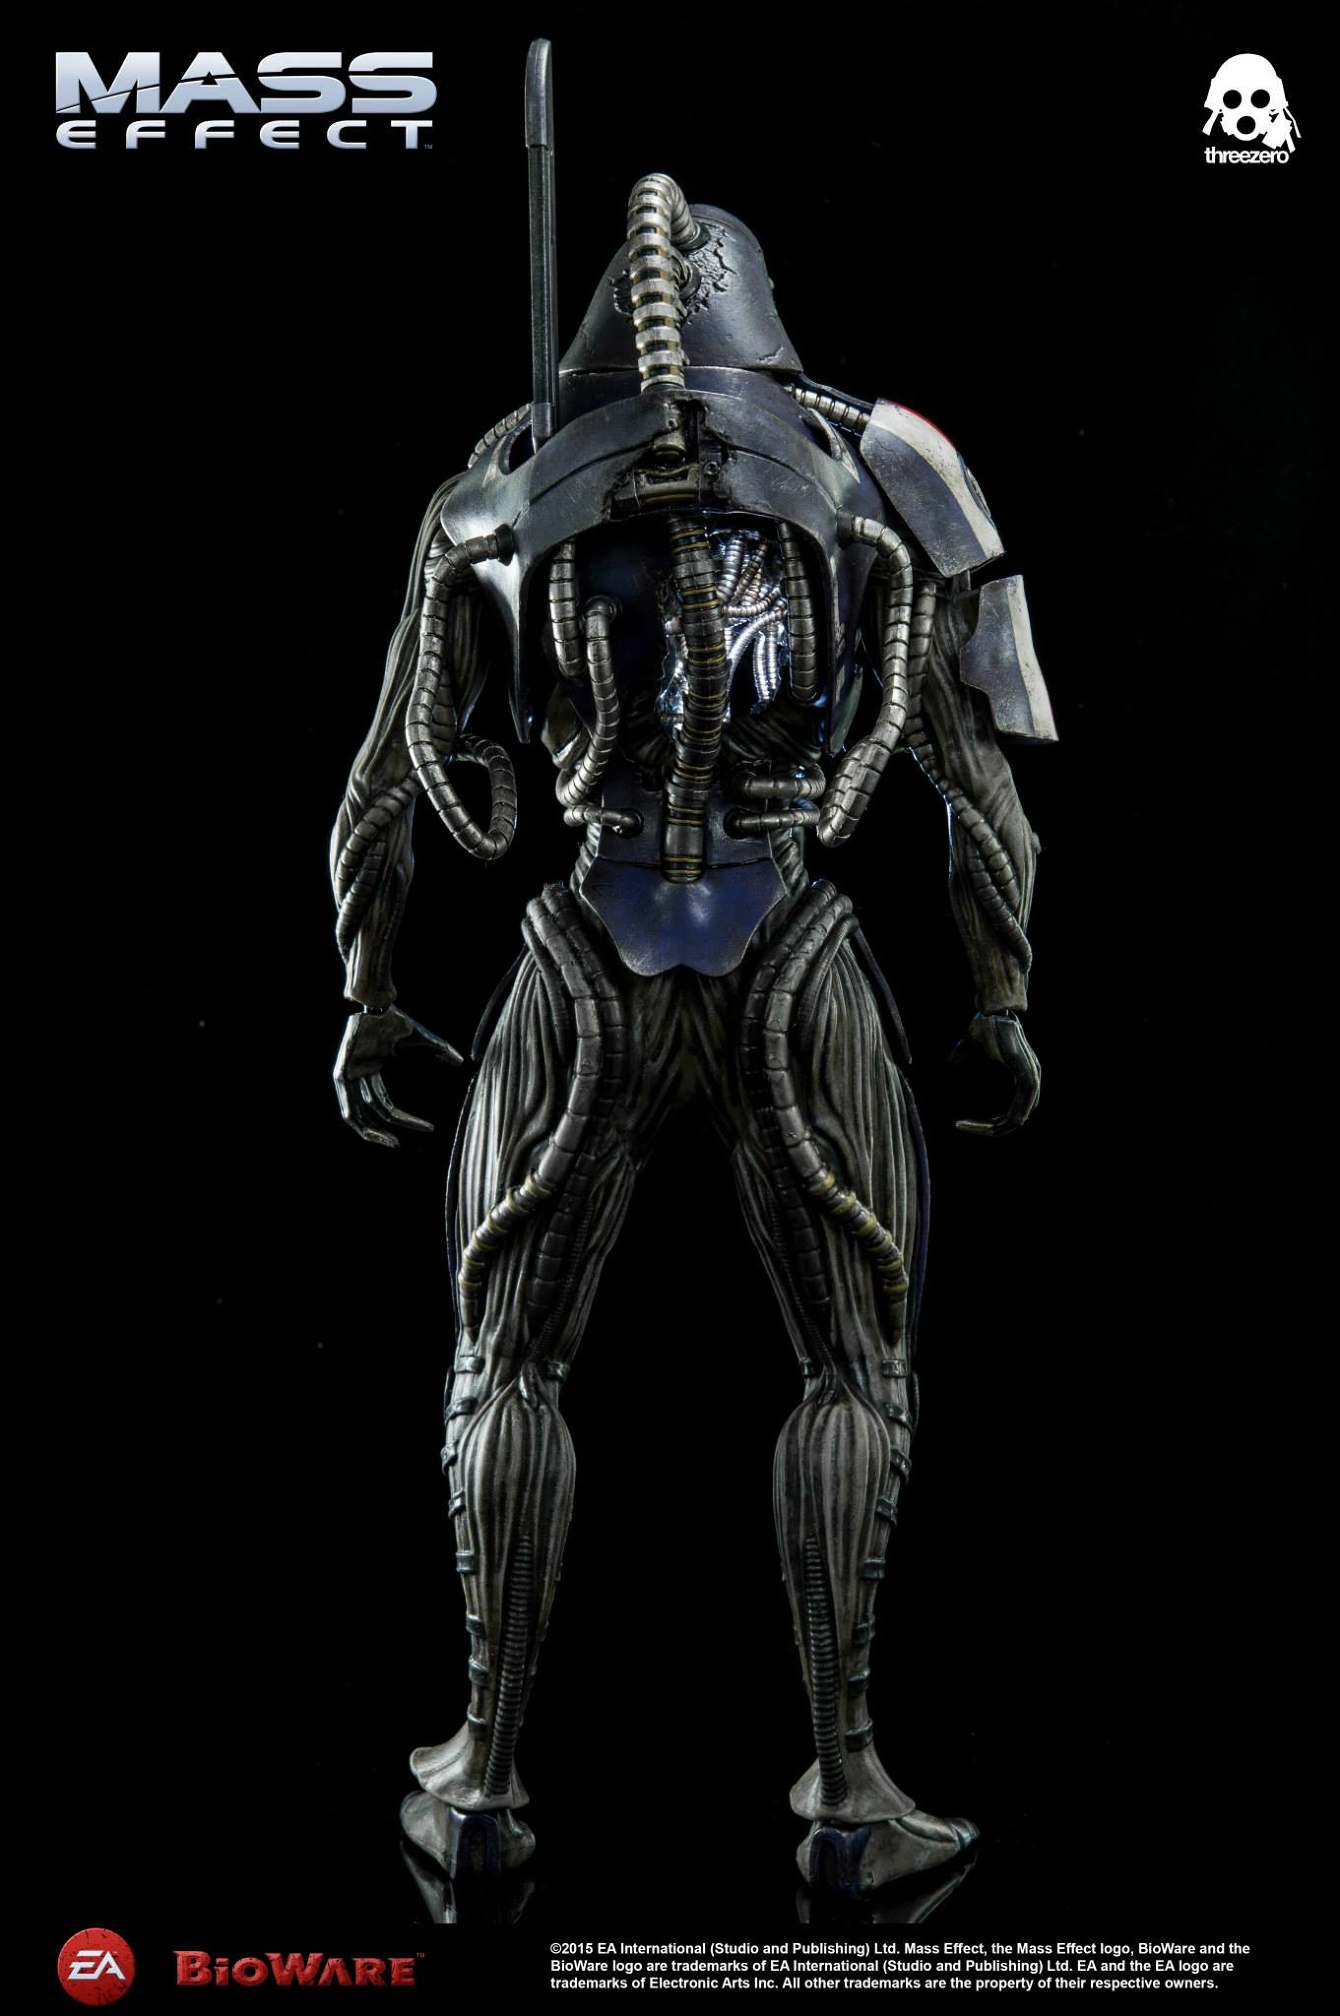 ThreeZero-Bioware-video-game-Legion-Mass-Effect-figure-15_1340_c.jpg